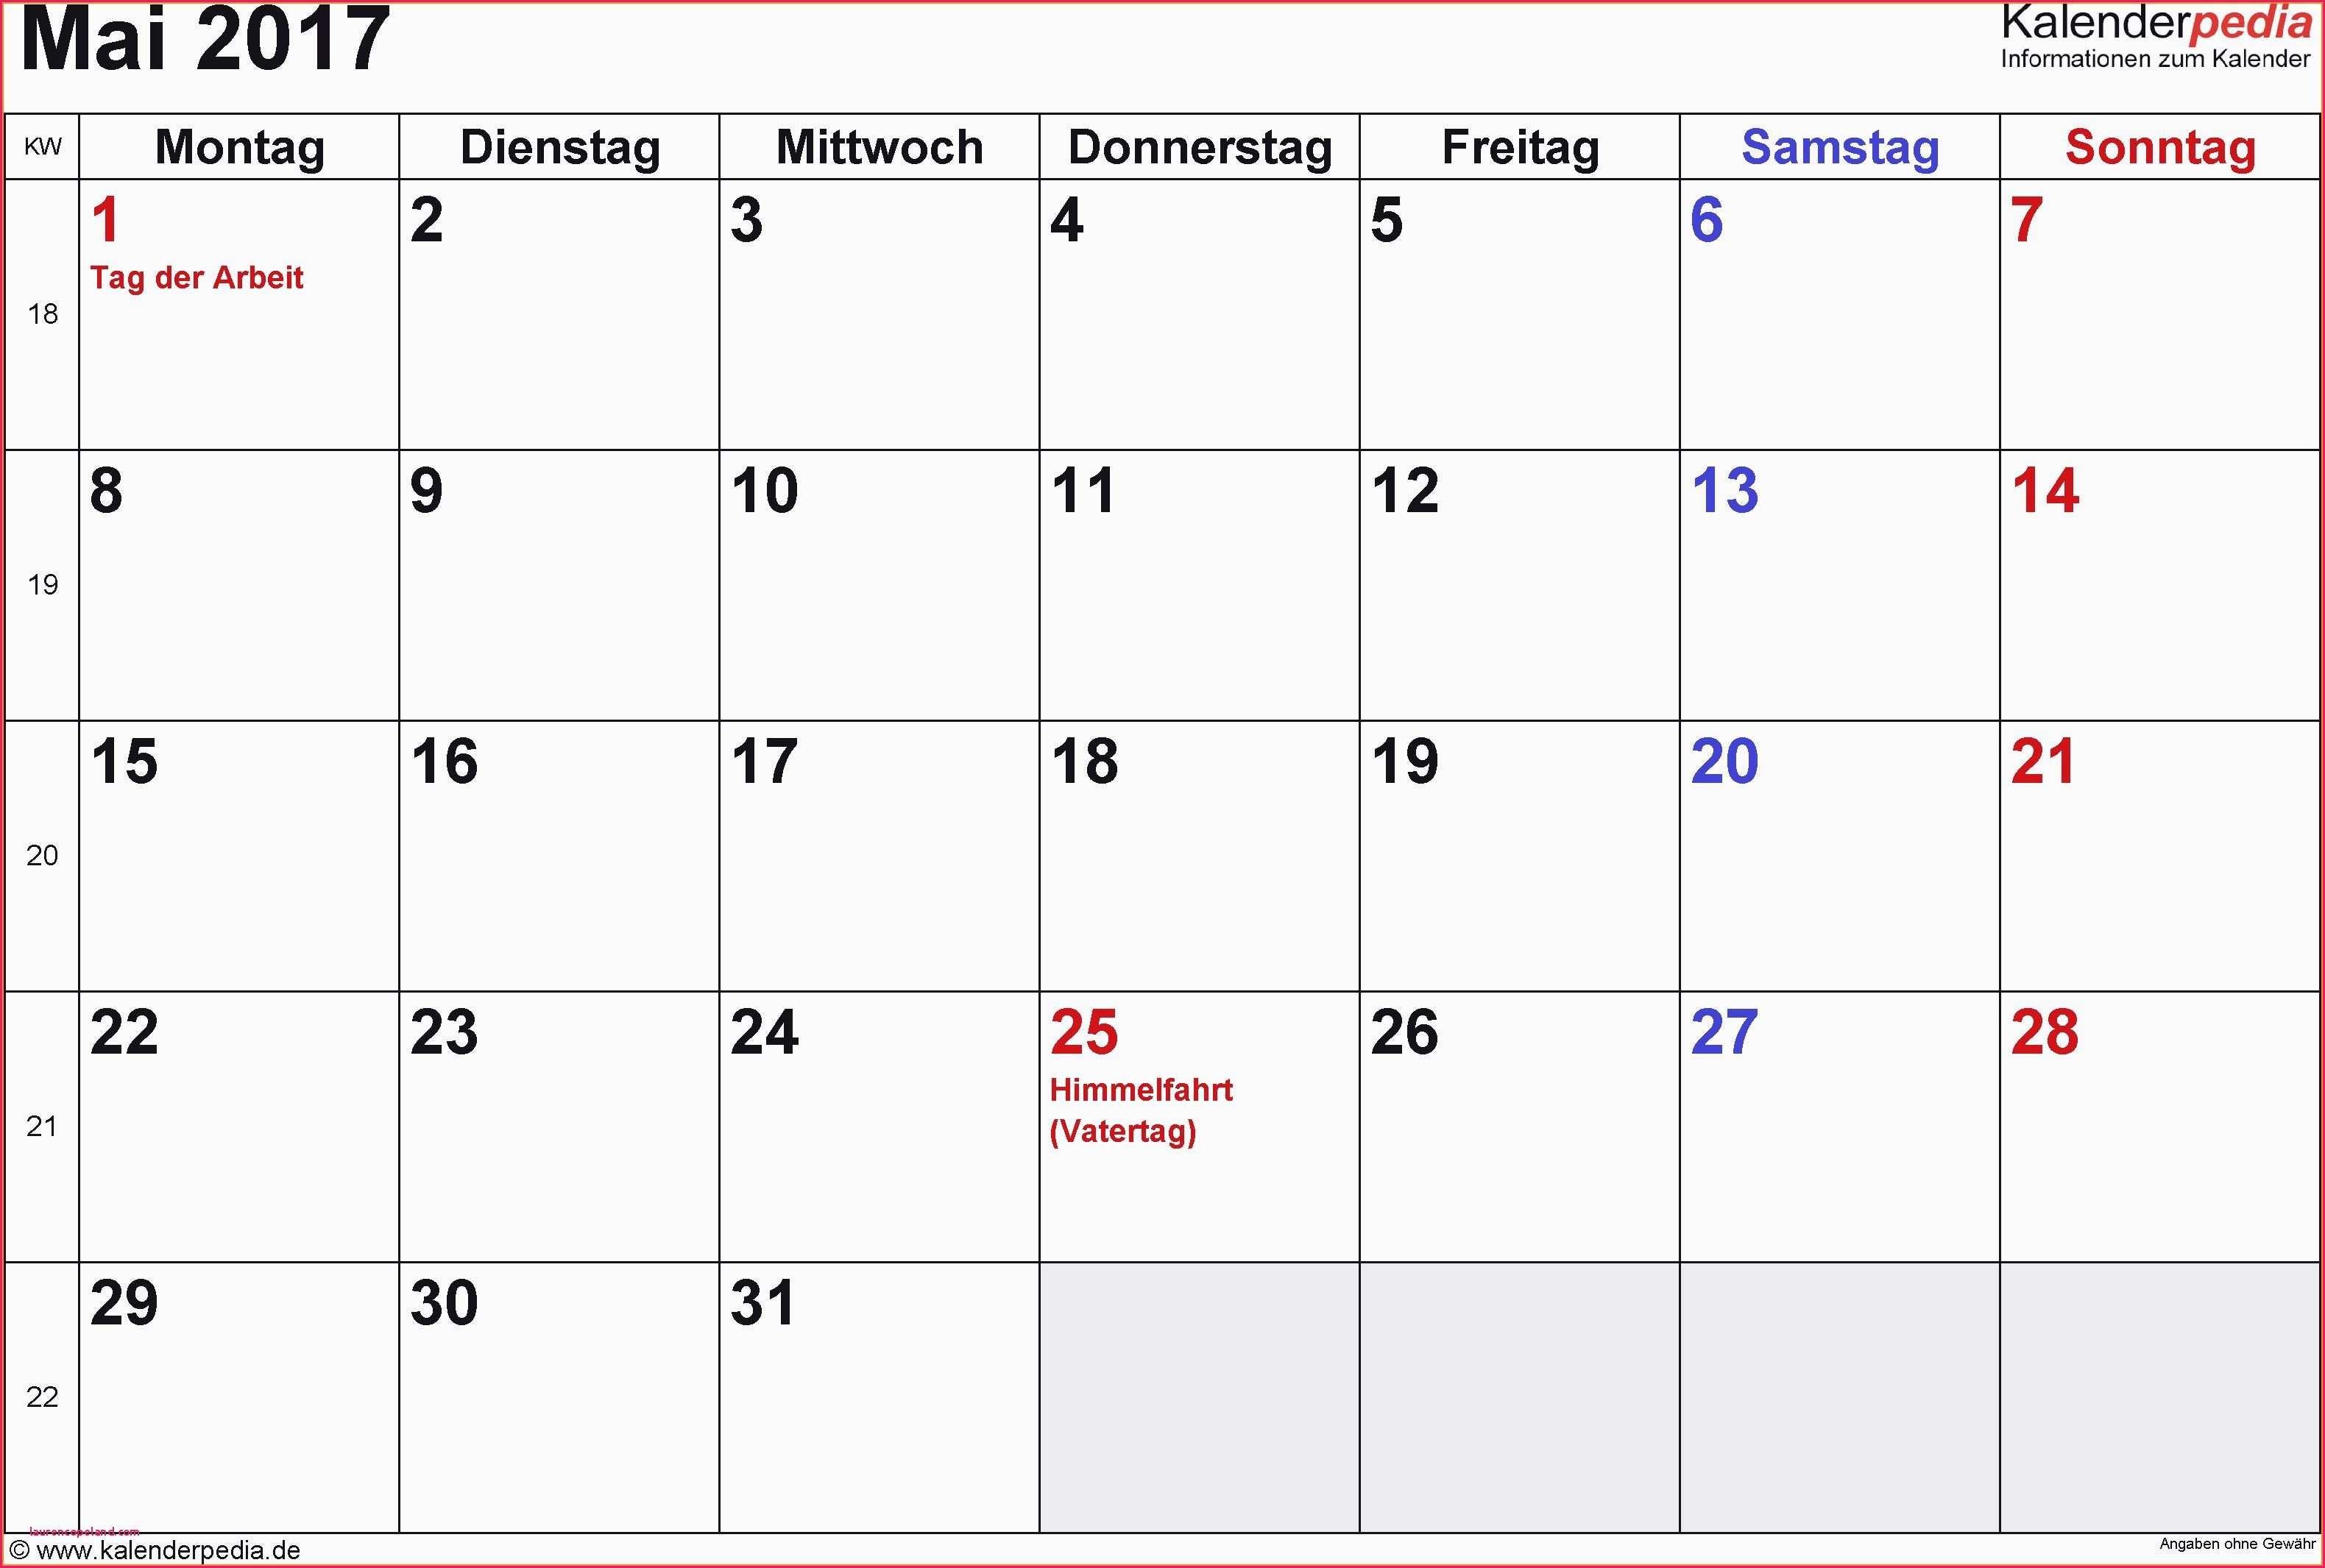 fotokalender 2018 vorlage kalender vorlage word di fotokalender 2018 vorlage 2